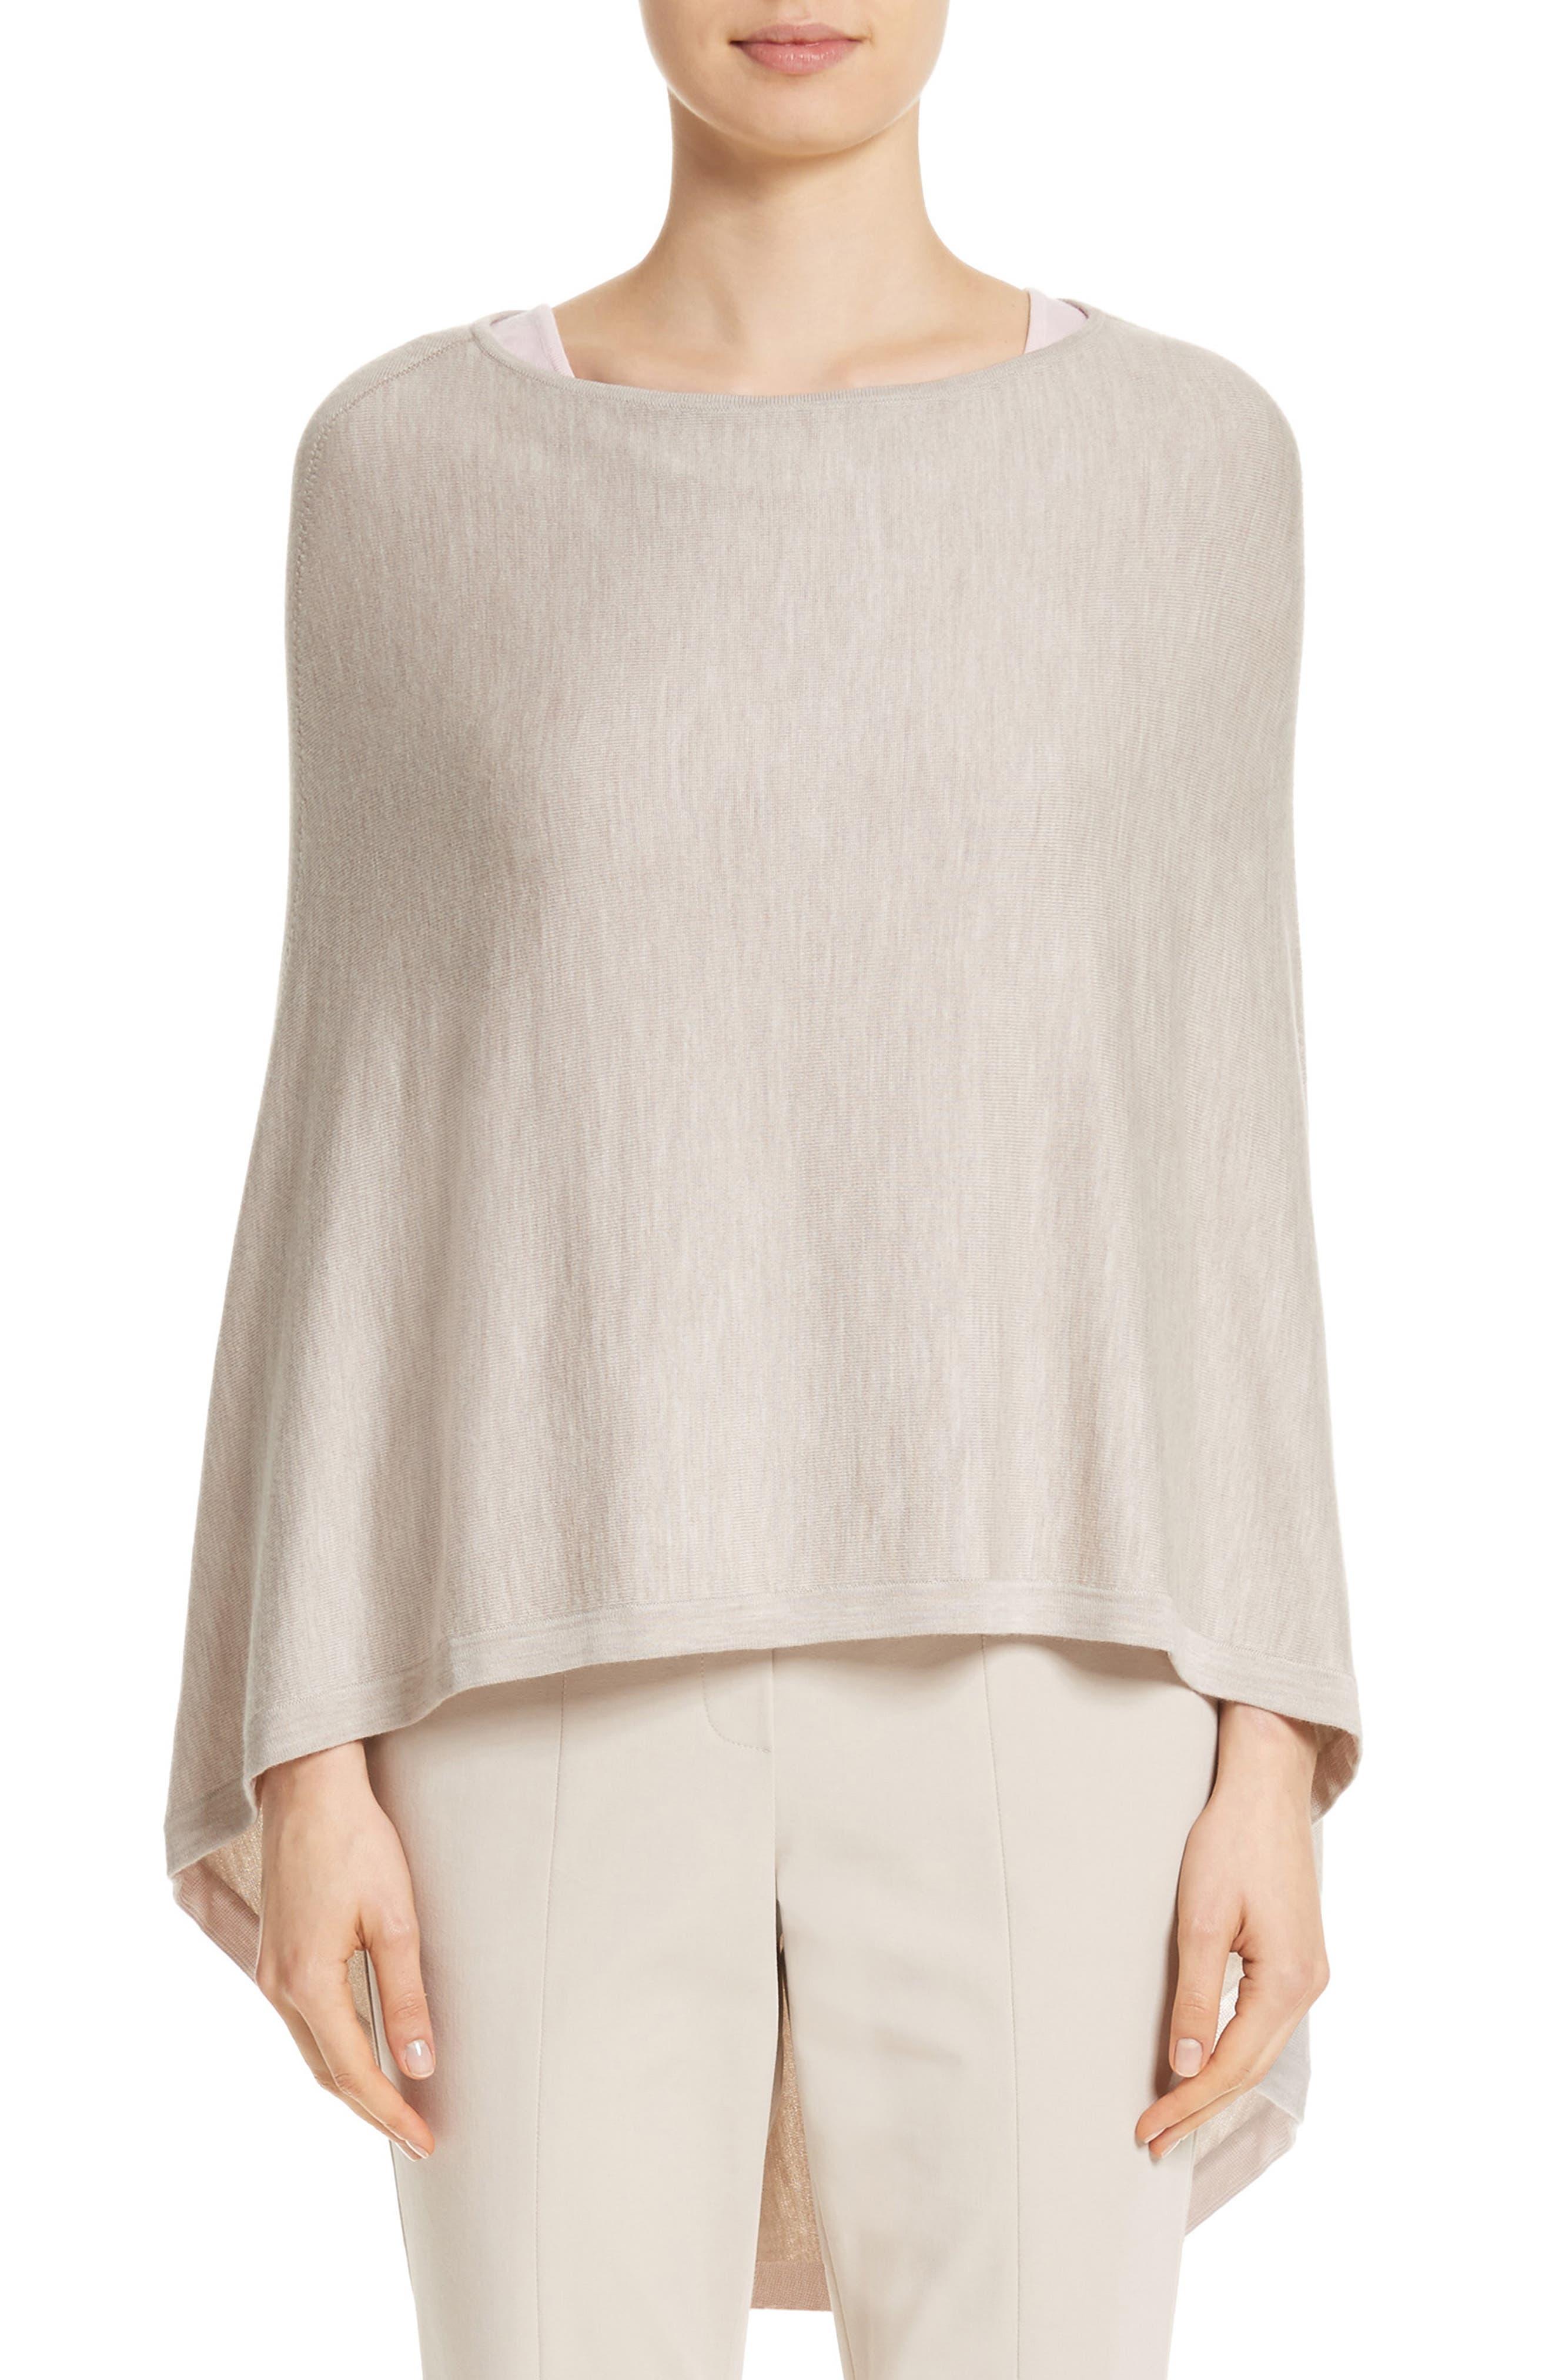 Rib Knit Poncho Sweater,                         Main,                         color, Stone Melange/Blush